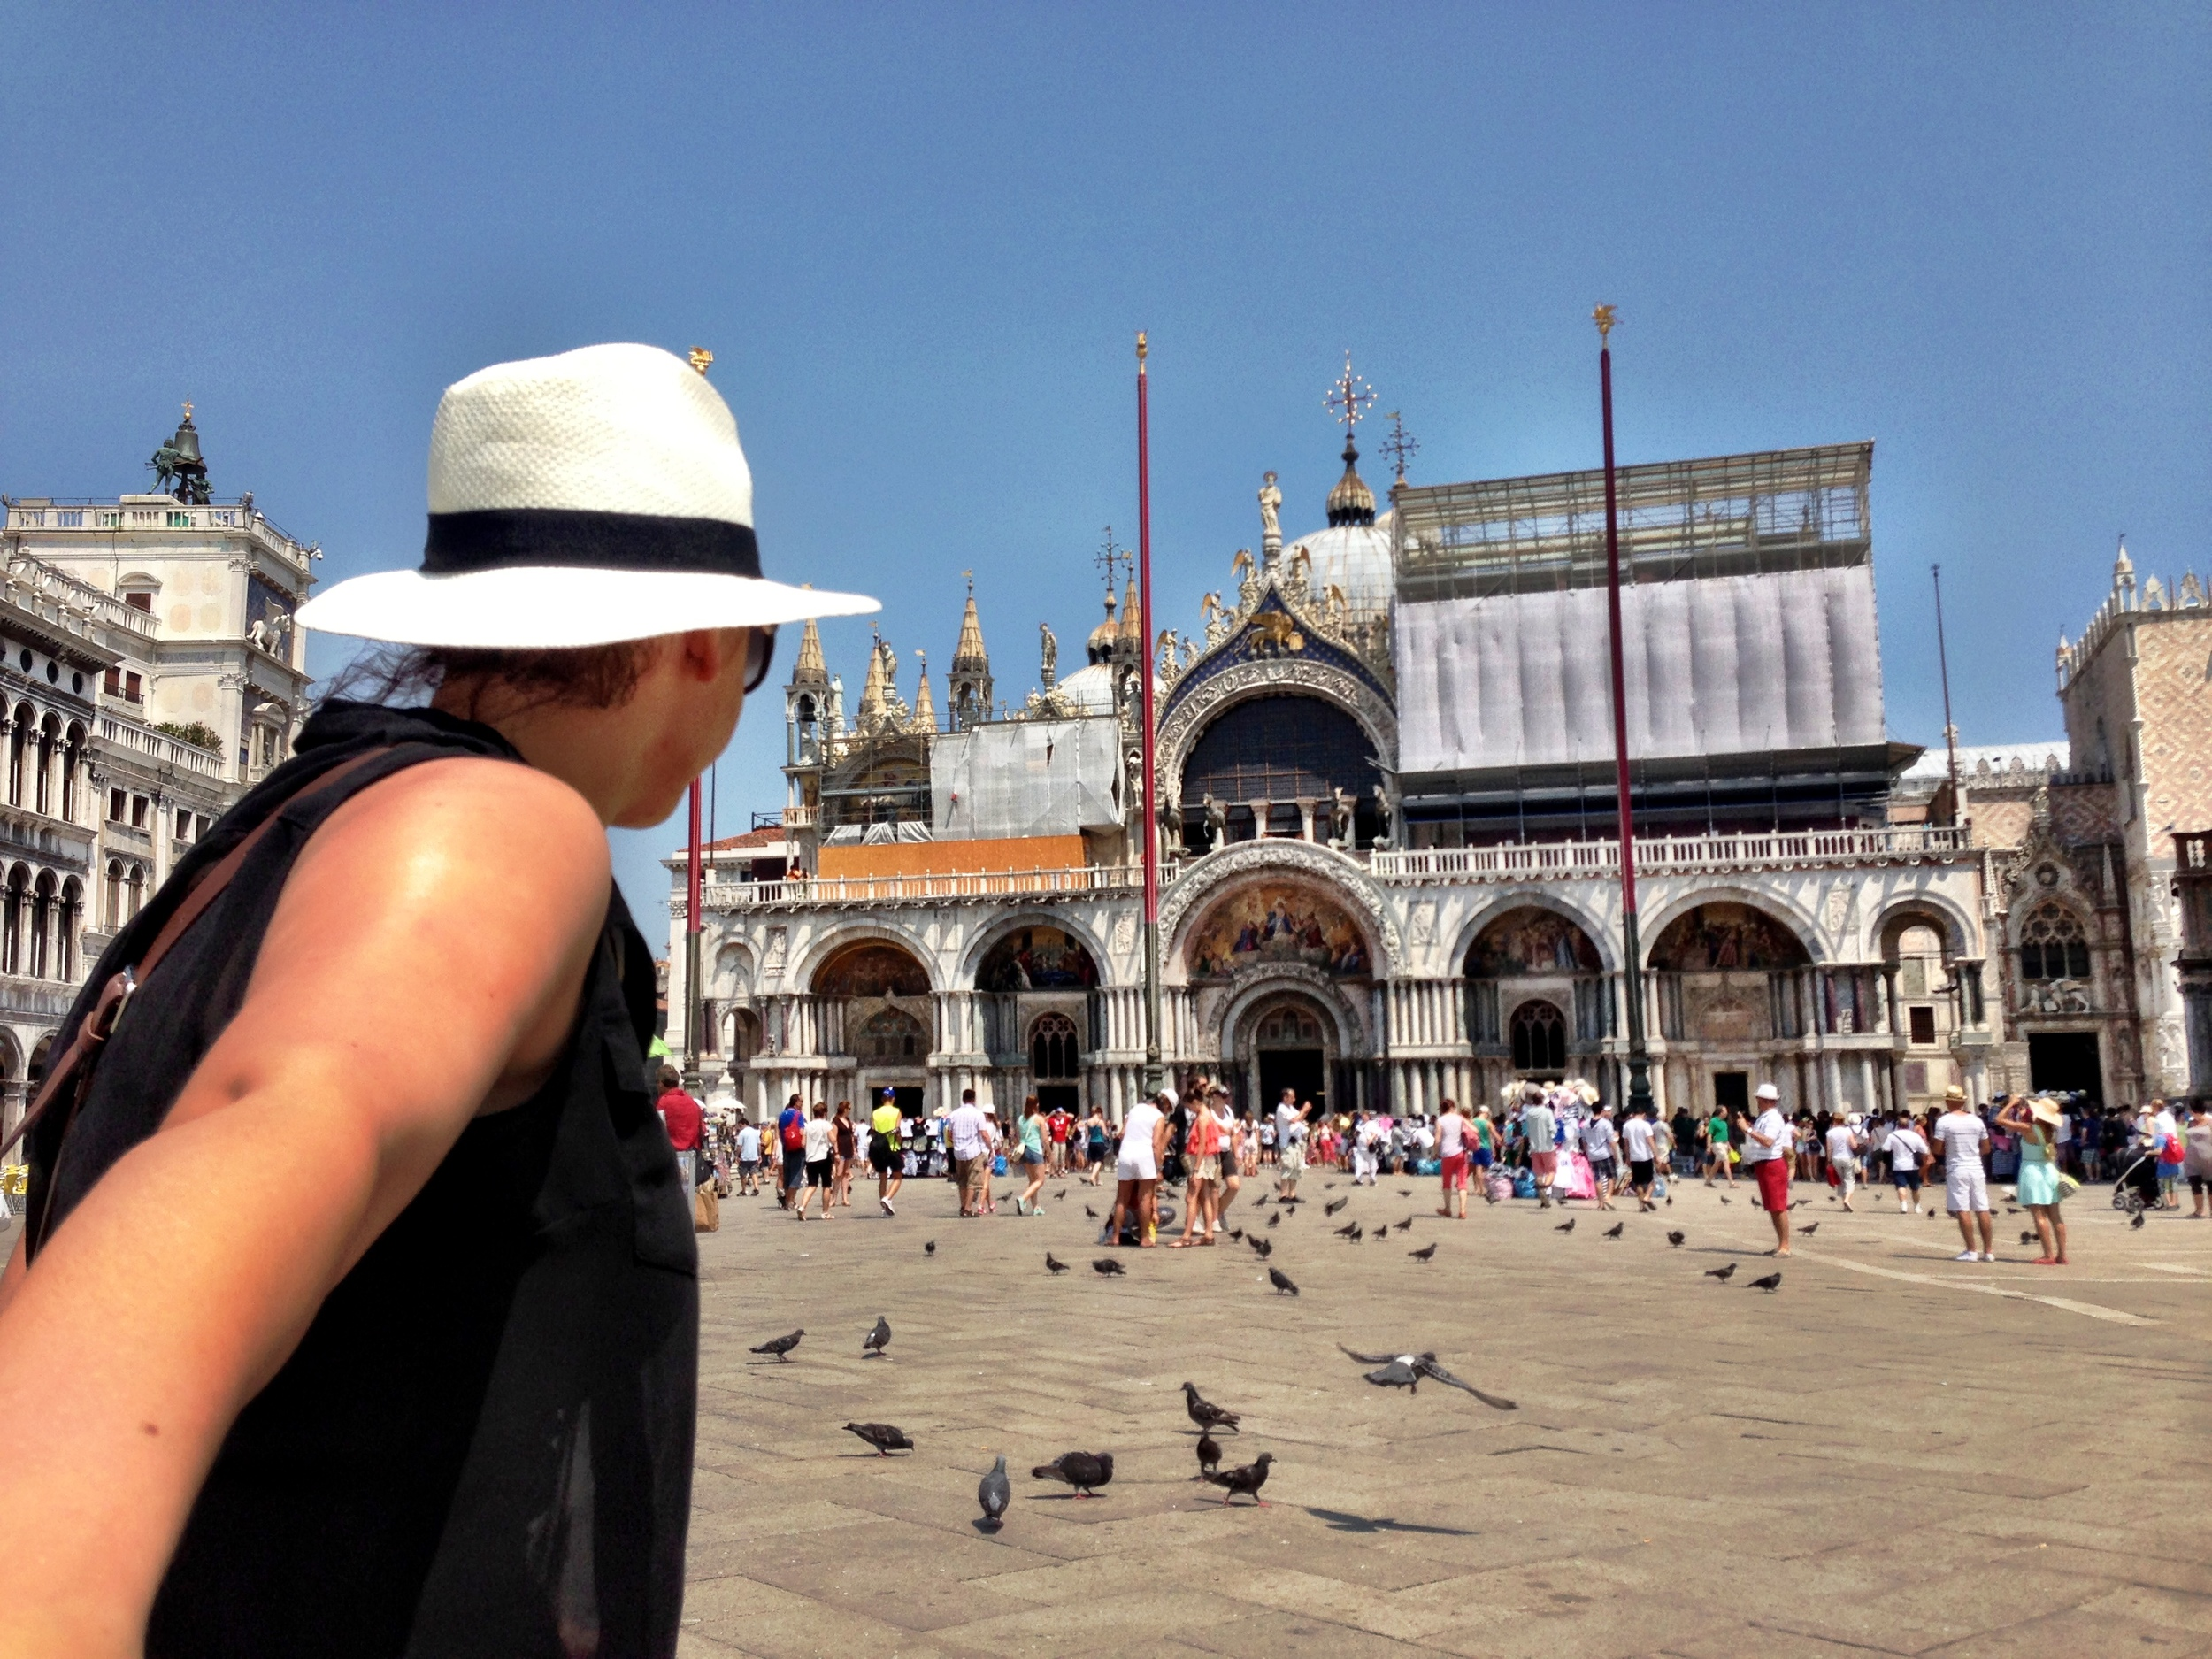 St Marks Square, Venice